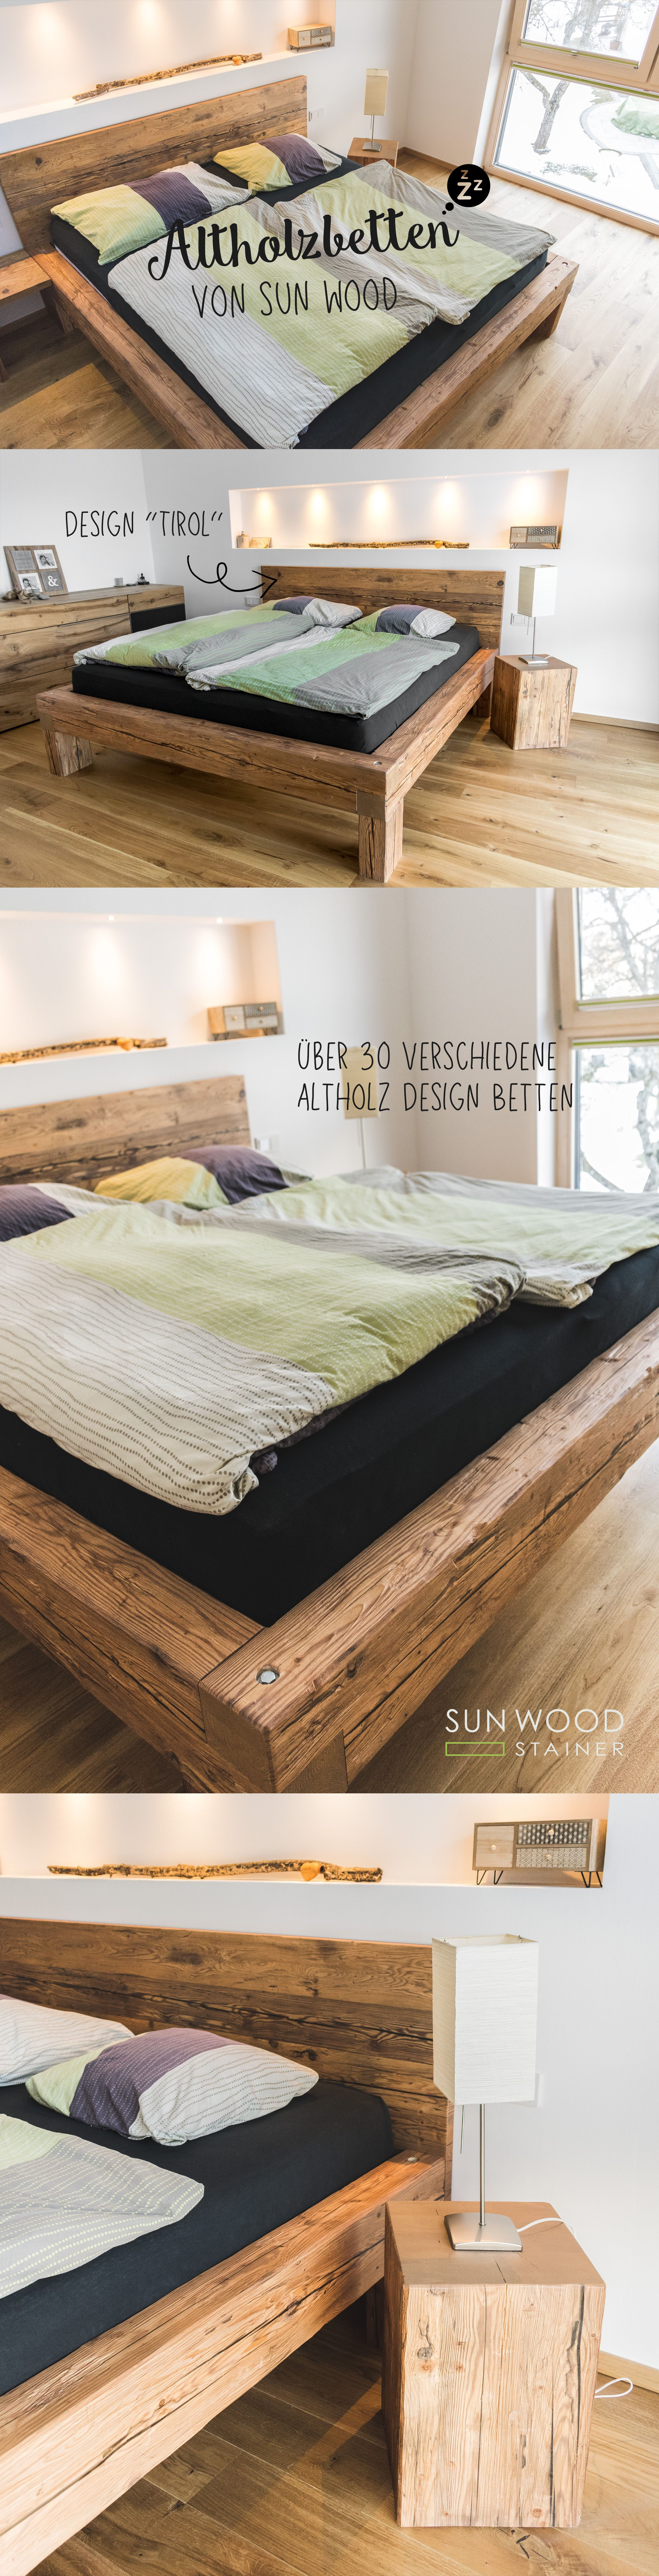 Massives Holzbett Altholzdesign Tirol 02 Mobel Marco De La Cama